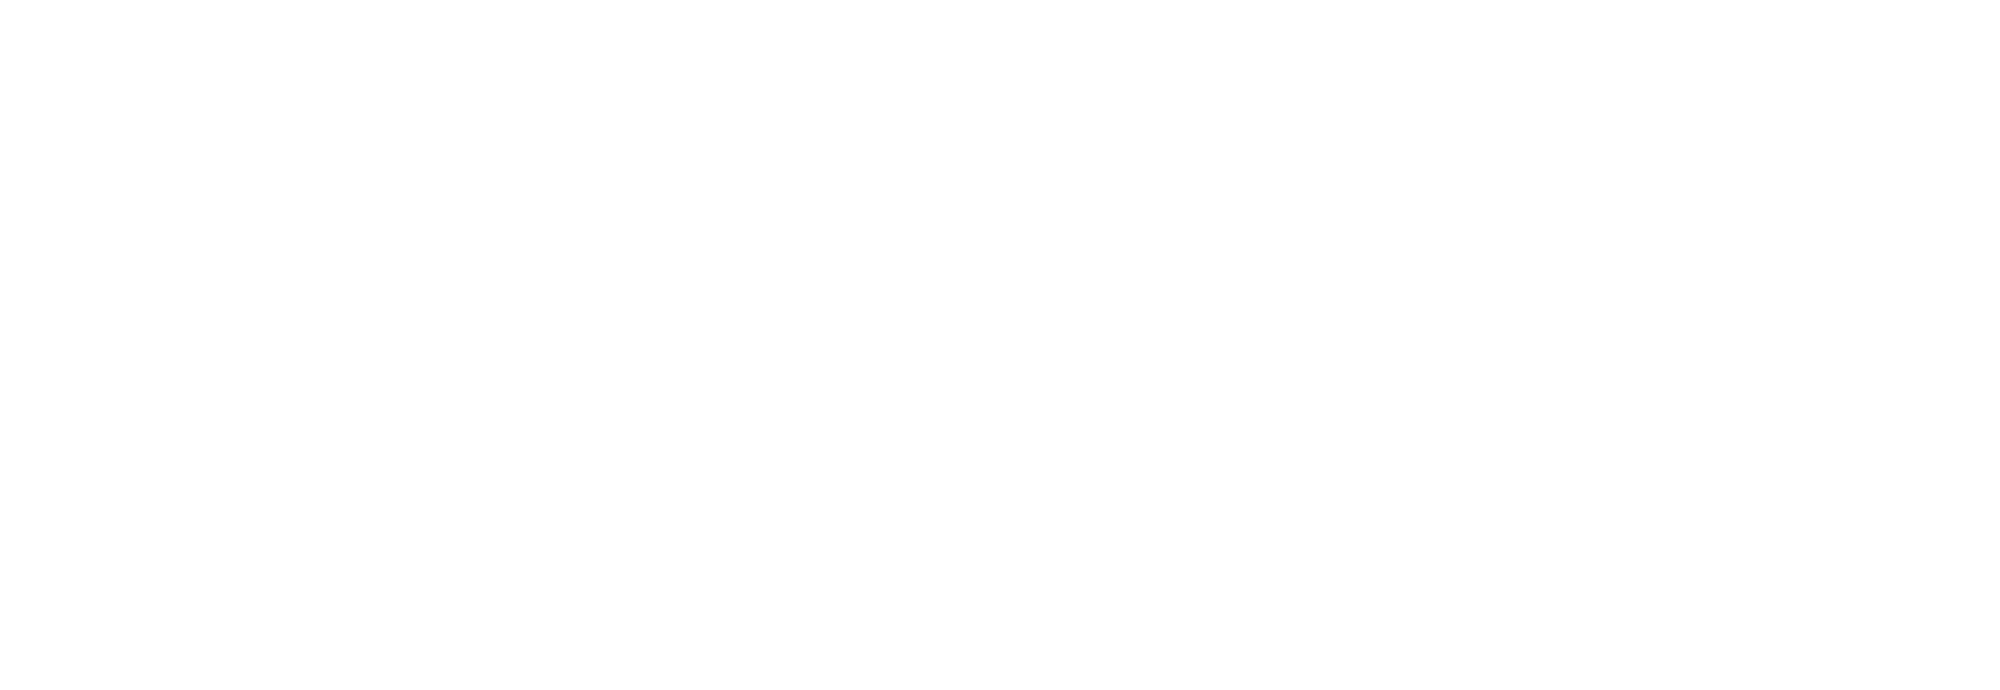 cote&ciel-logo_black.png